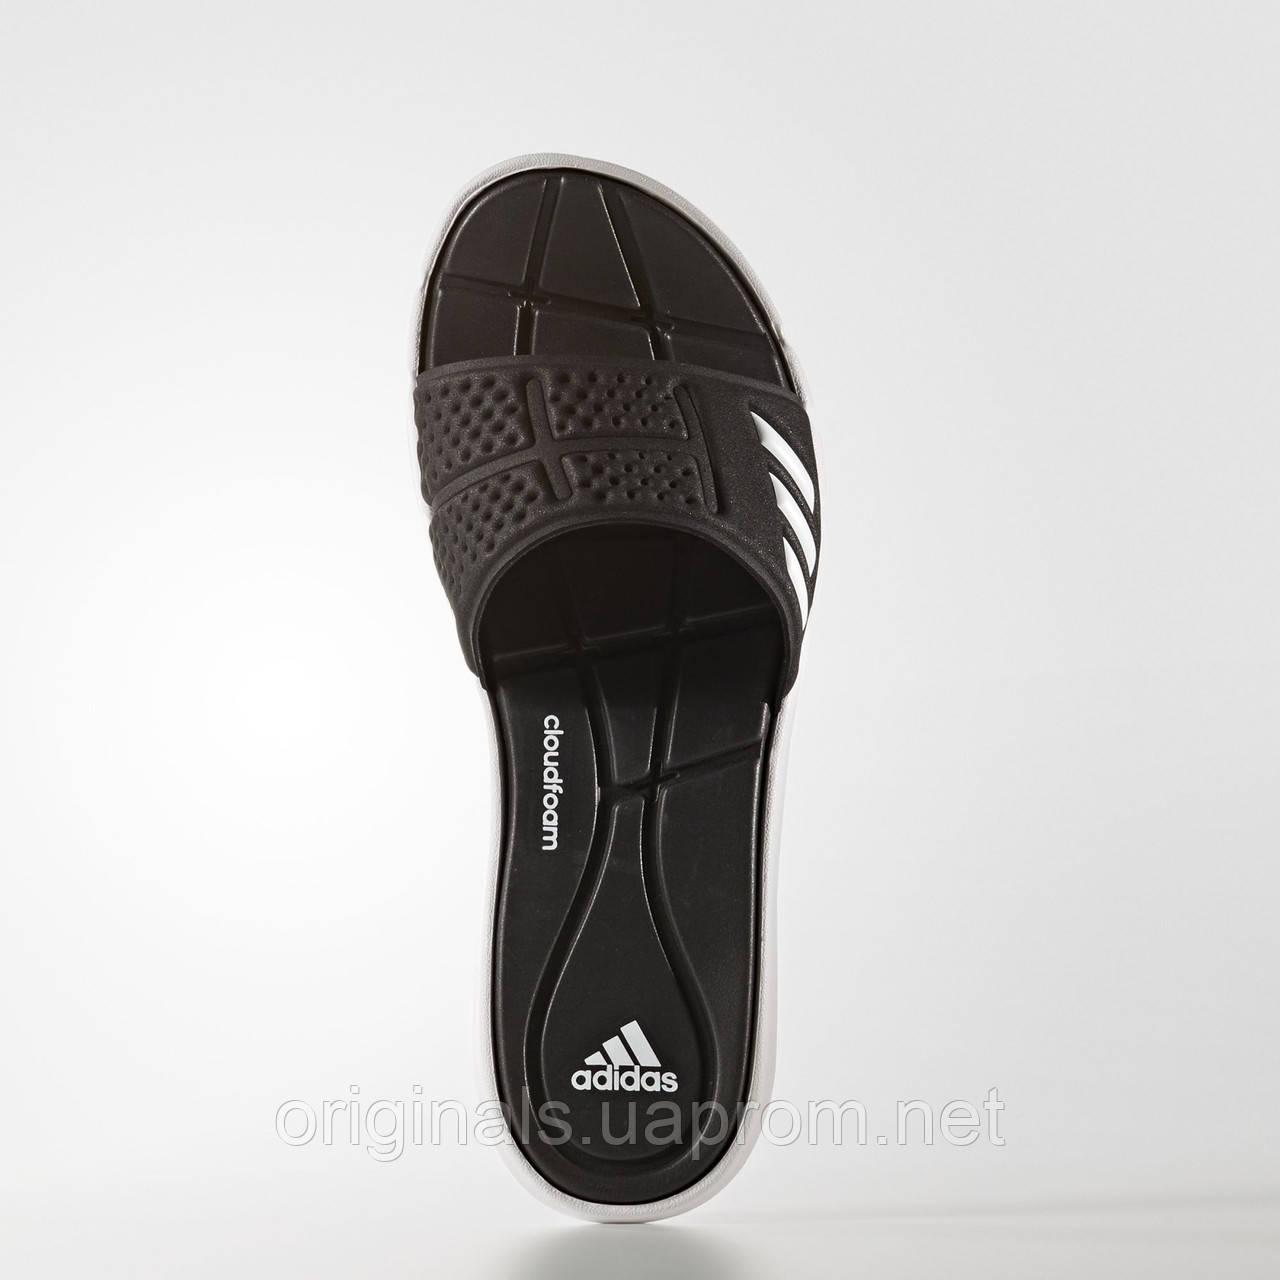 581d00c76b85 Шлепанцы женские adidas adipure Cloudfoam BB4558